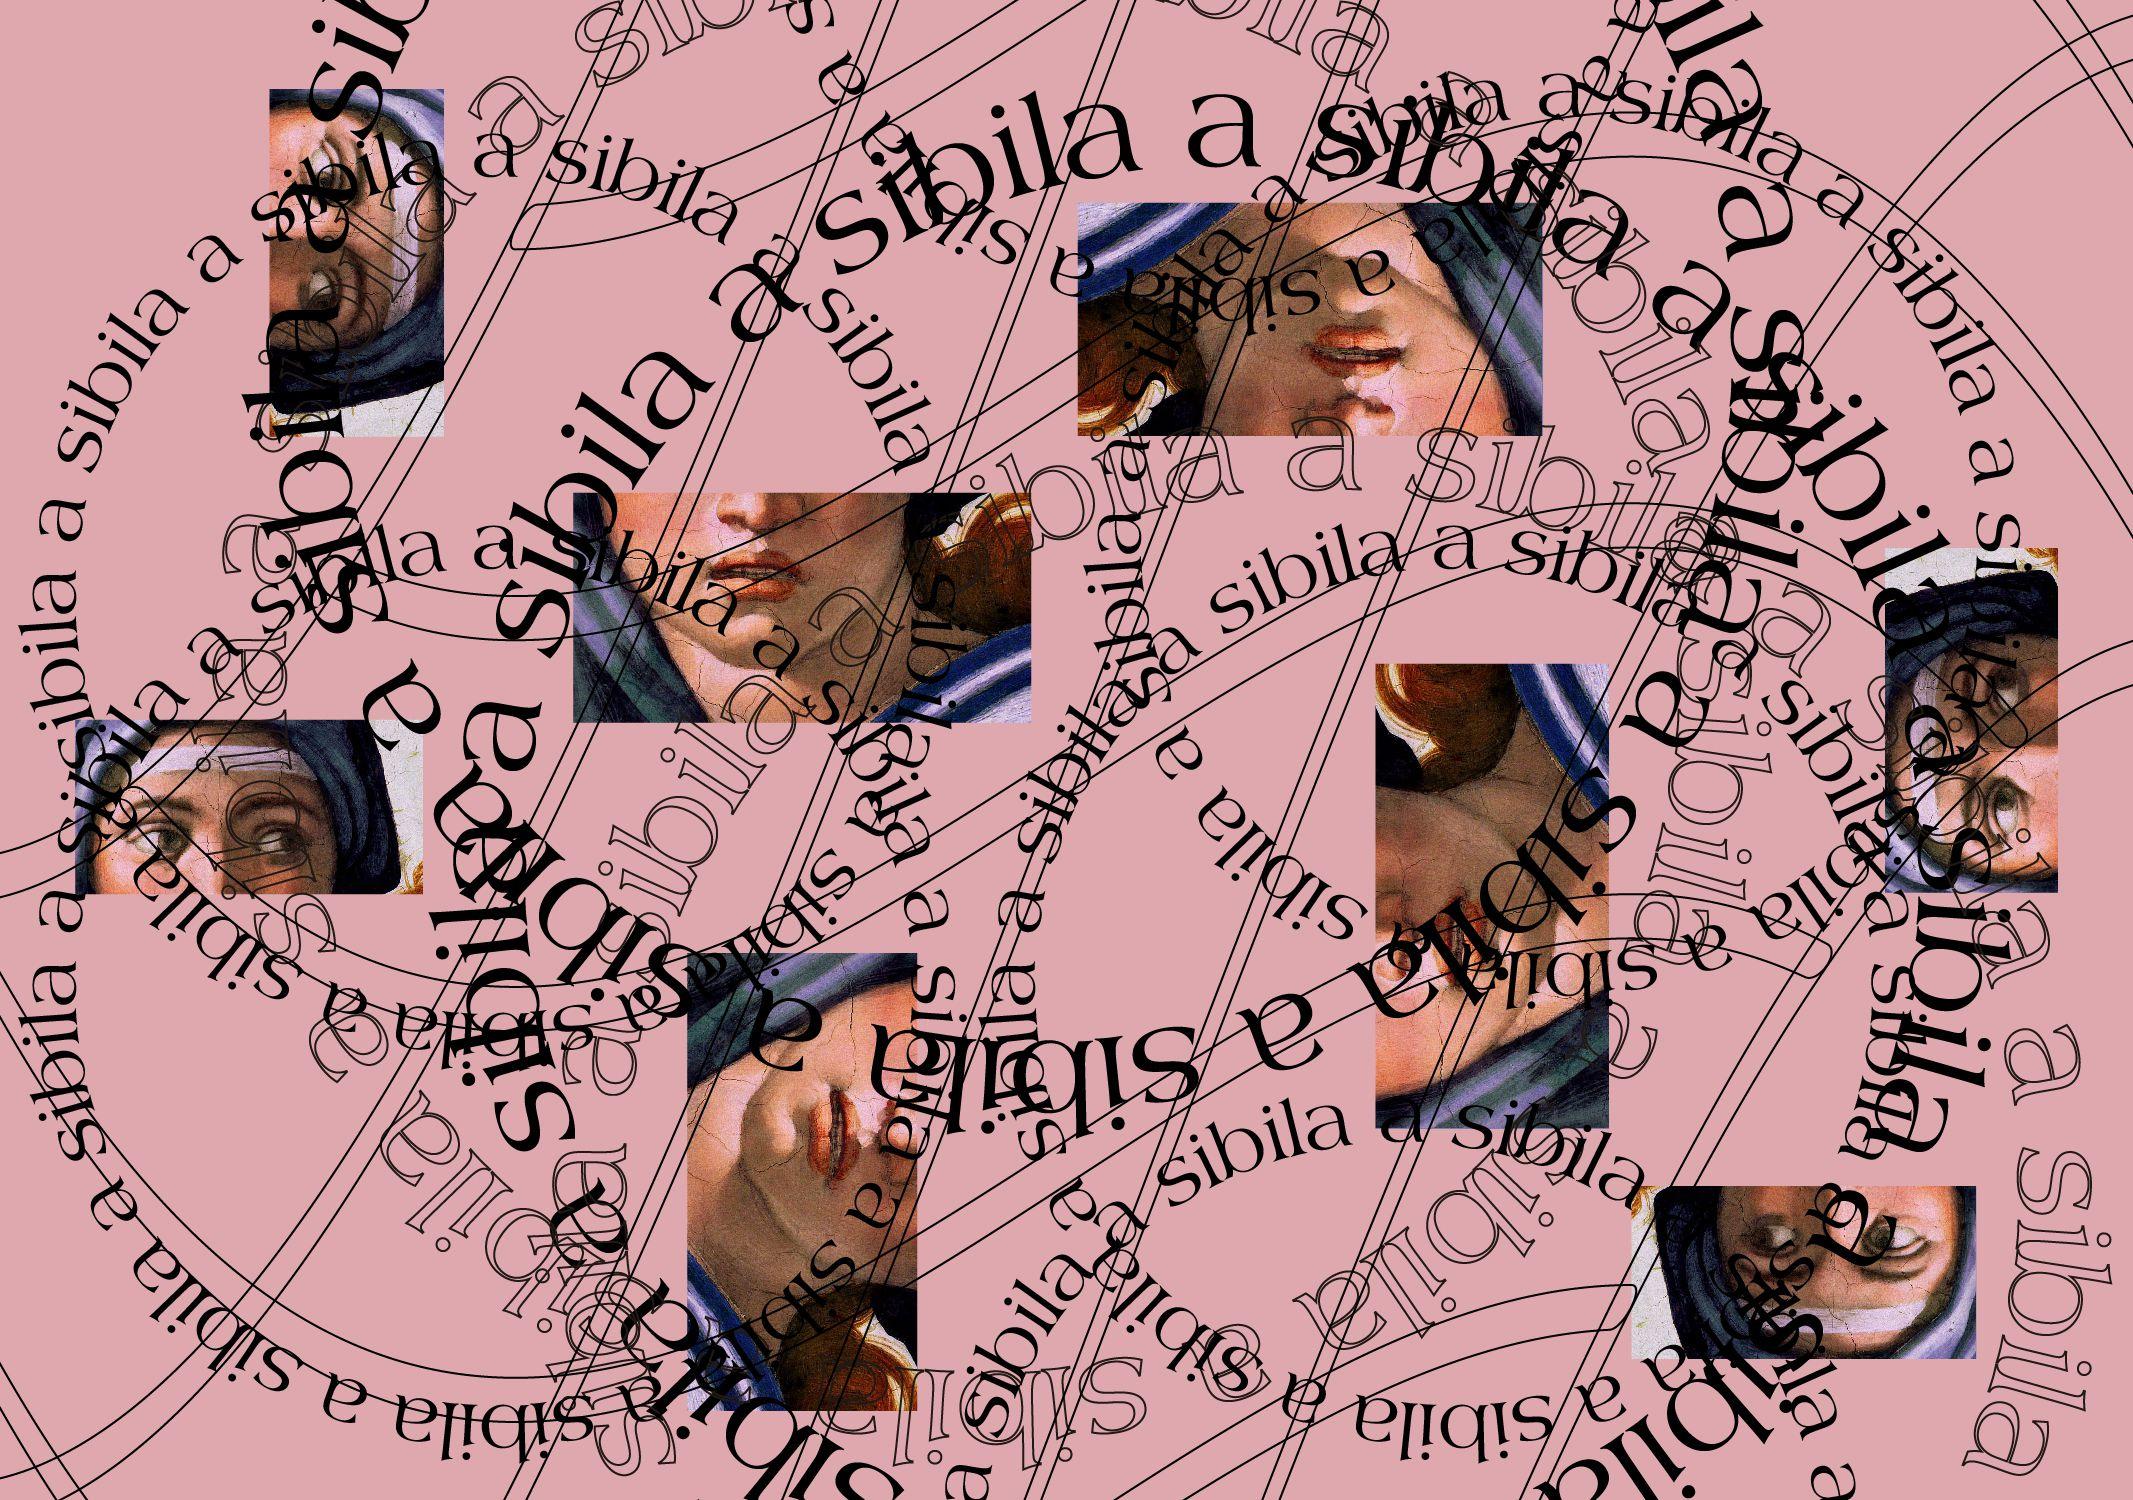 Ano Agustina: 'A Sibila', uma proposta de humanidade